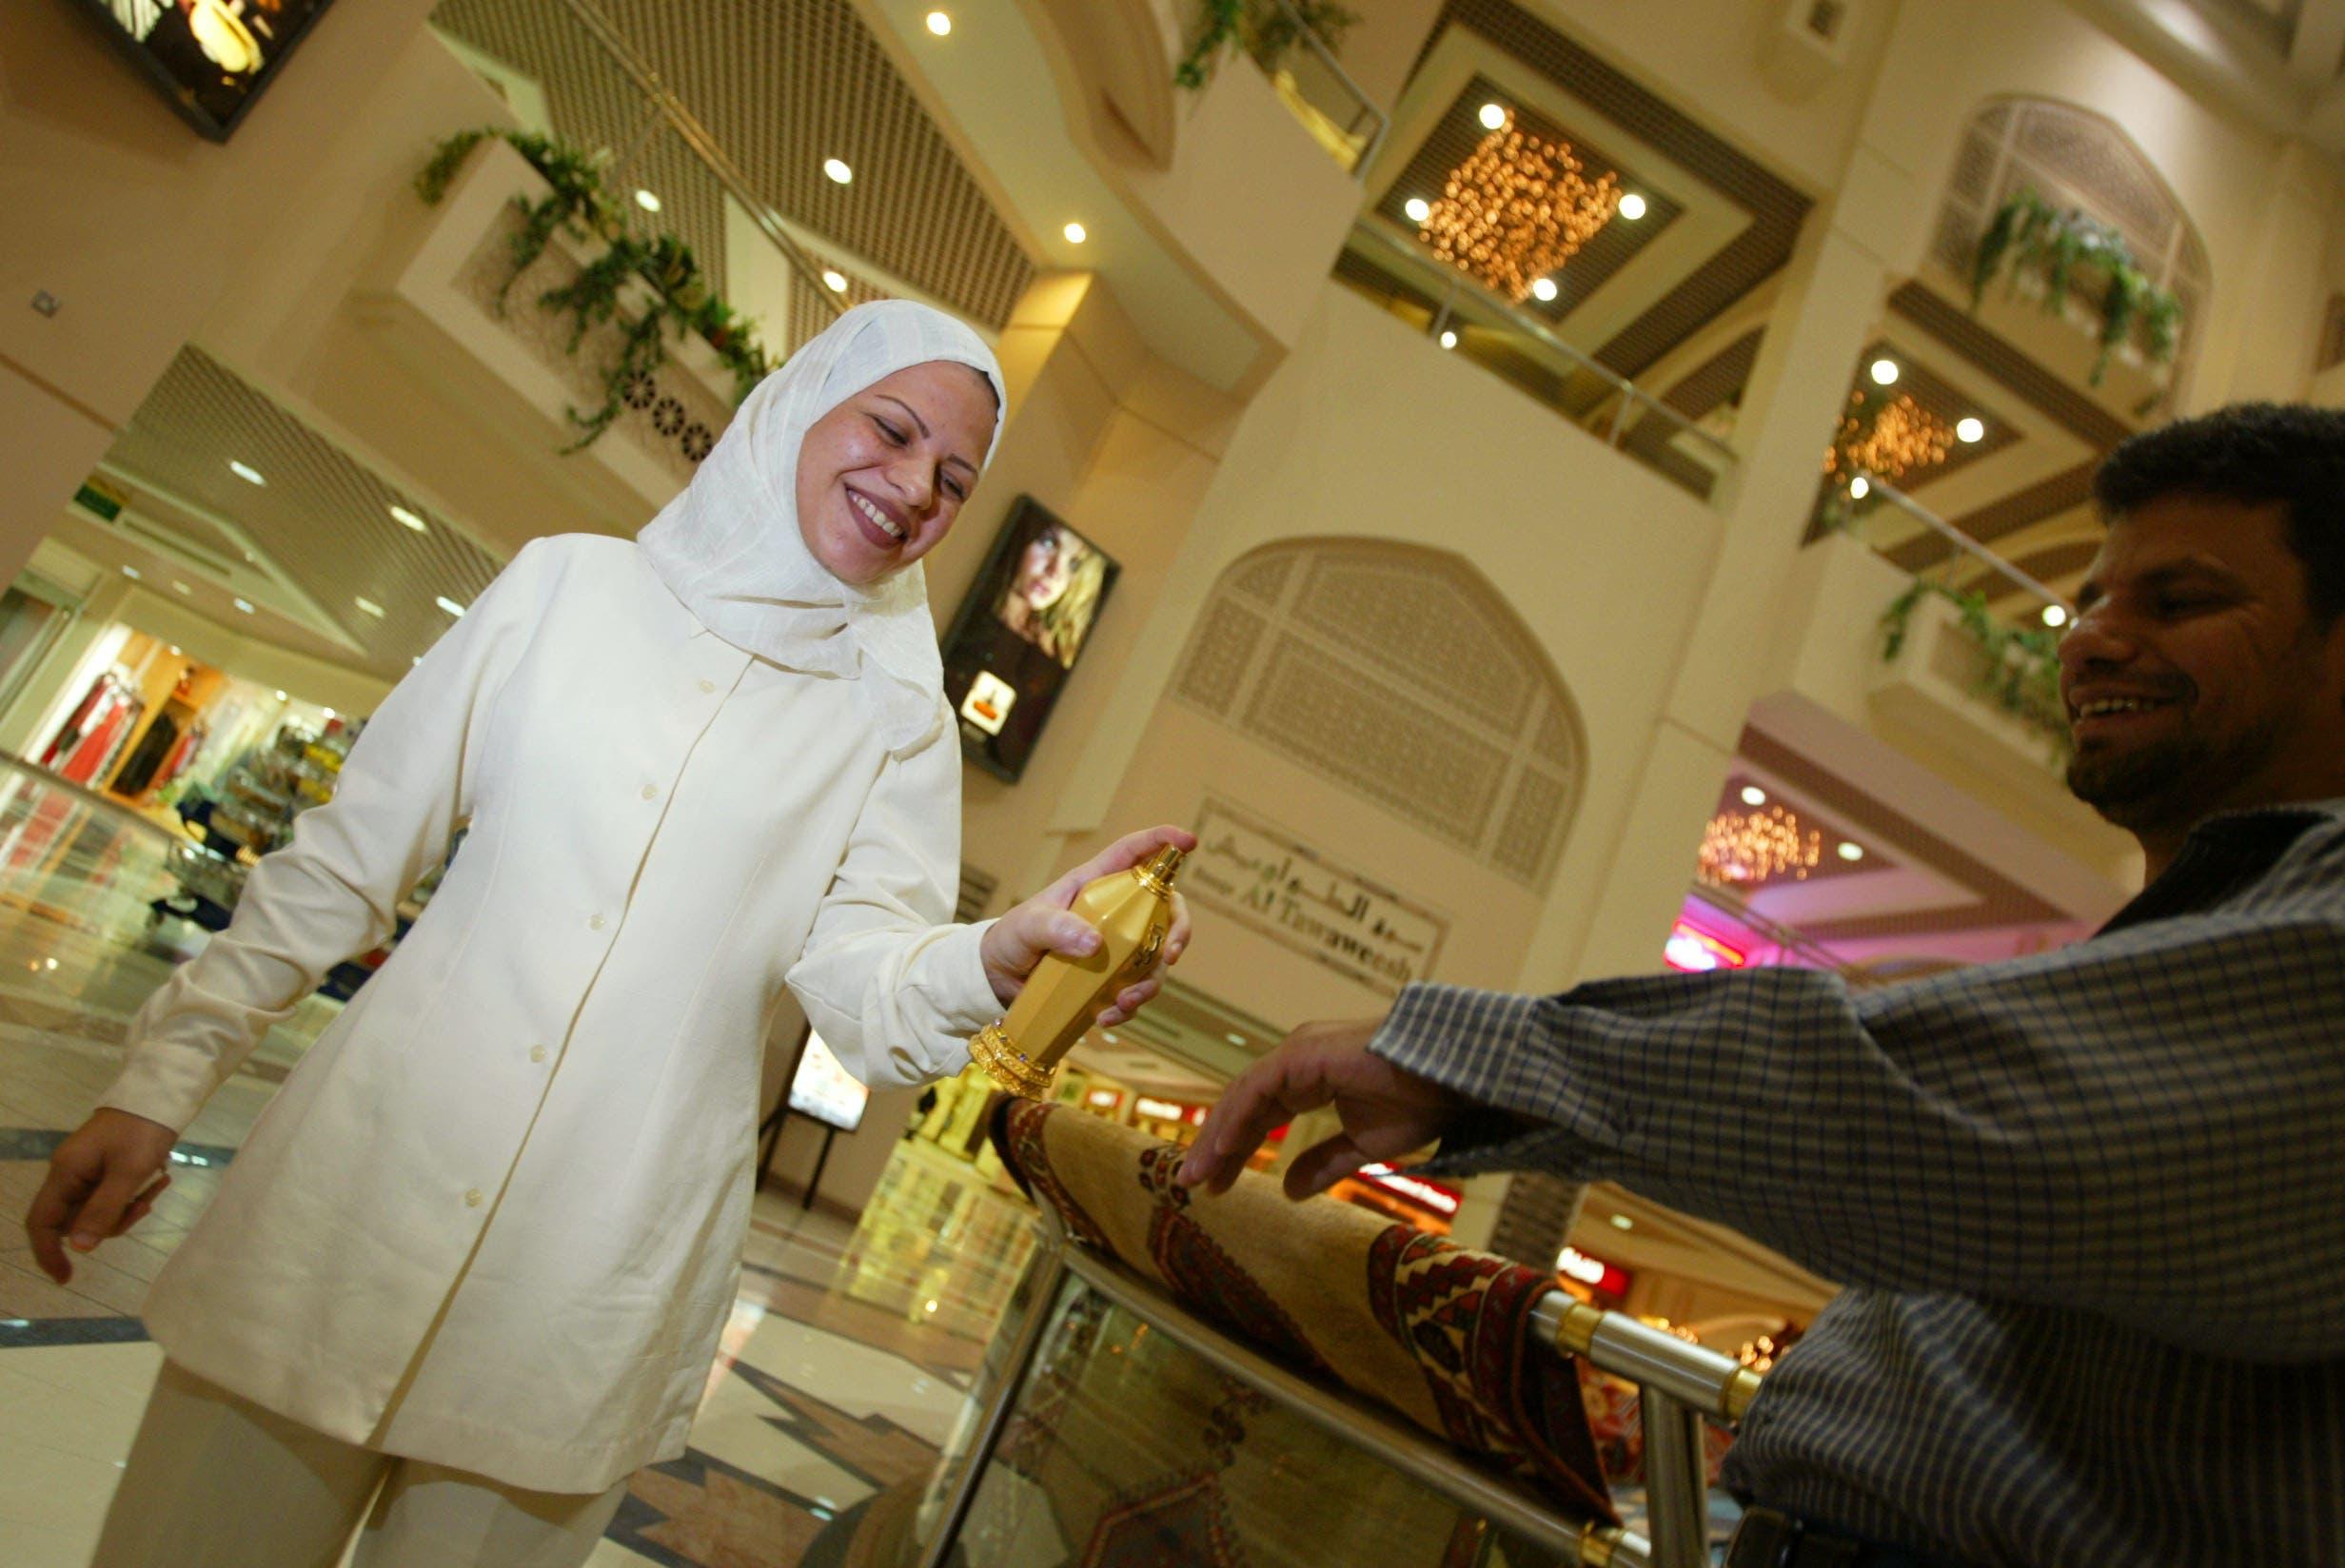 NY inspired scent debuts in Dubai with Emirati Abaya fashion designer at Lafayette Galleries in Dubai Mall